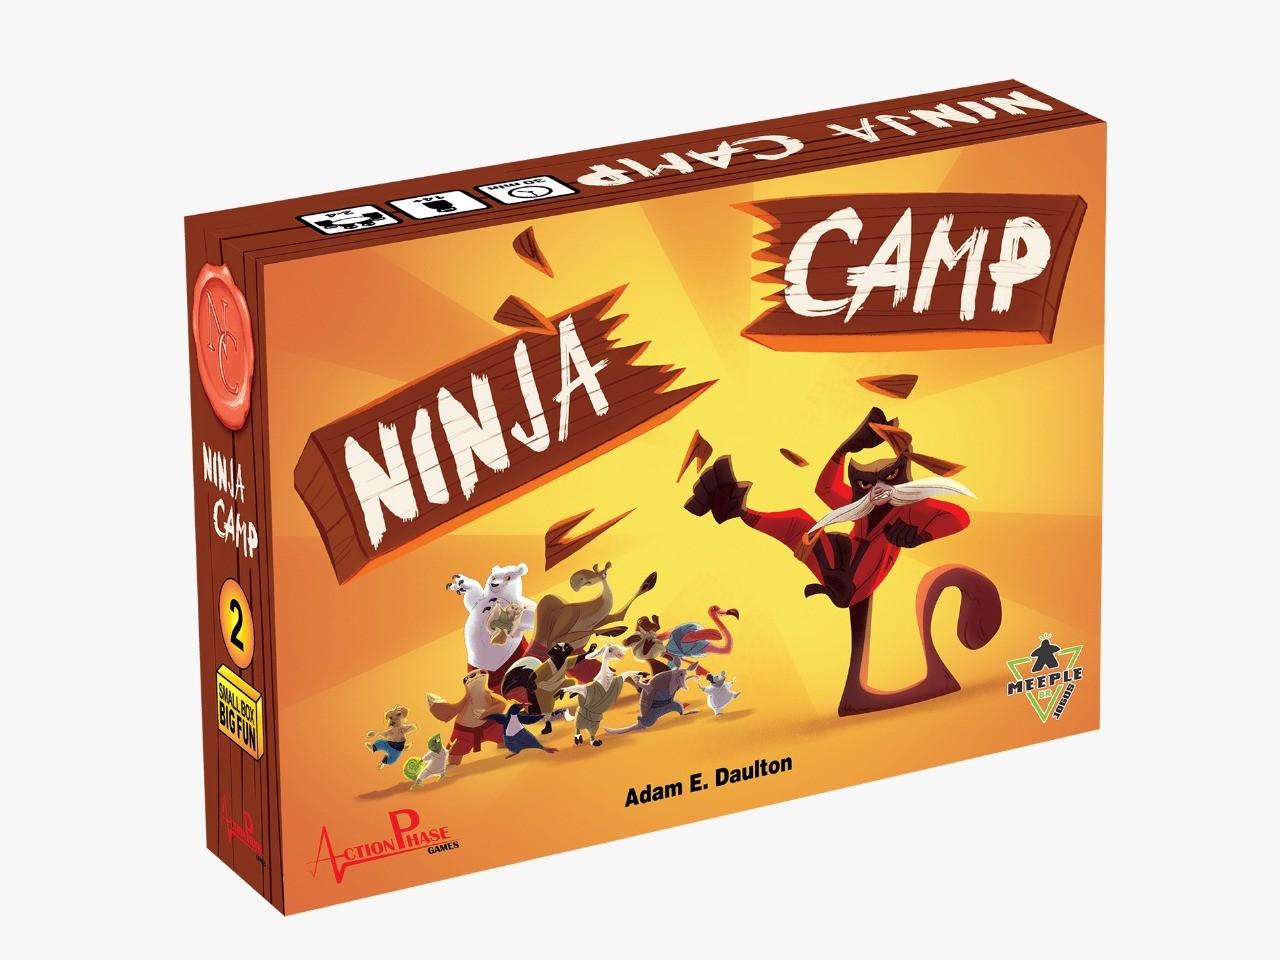 Ninja Camp Jogo de Tabuleiro Meeple BR  - Place Games